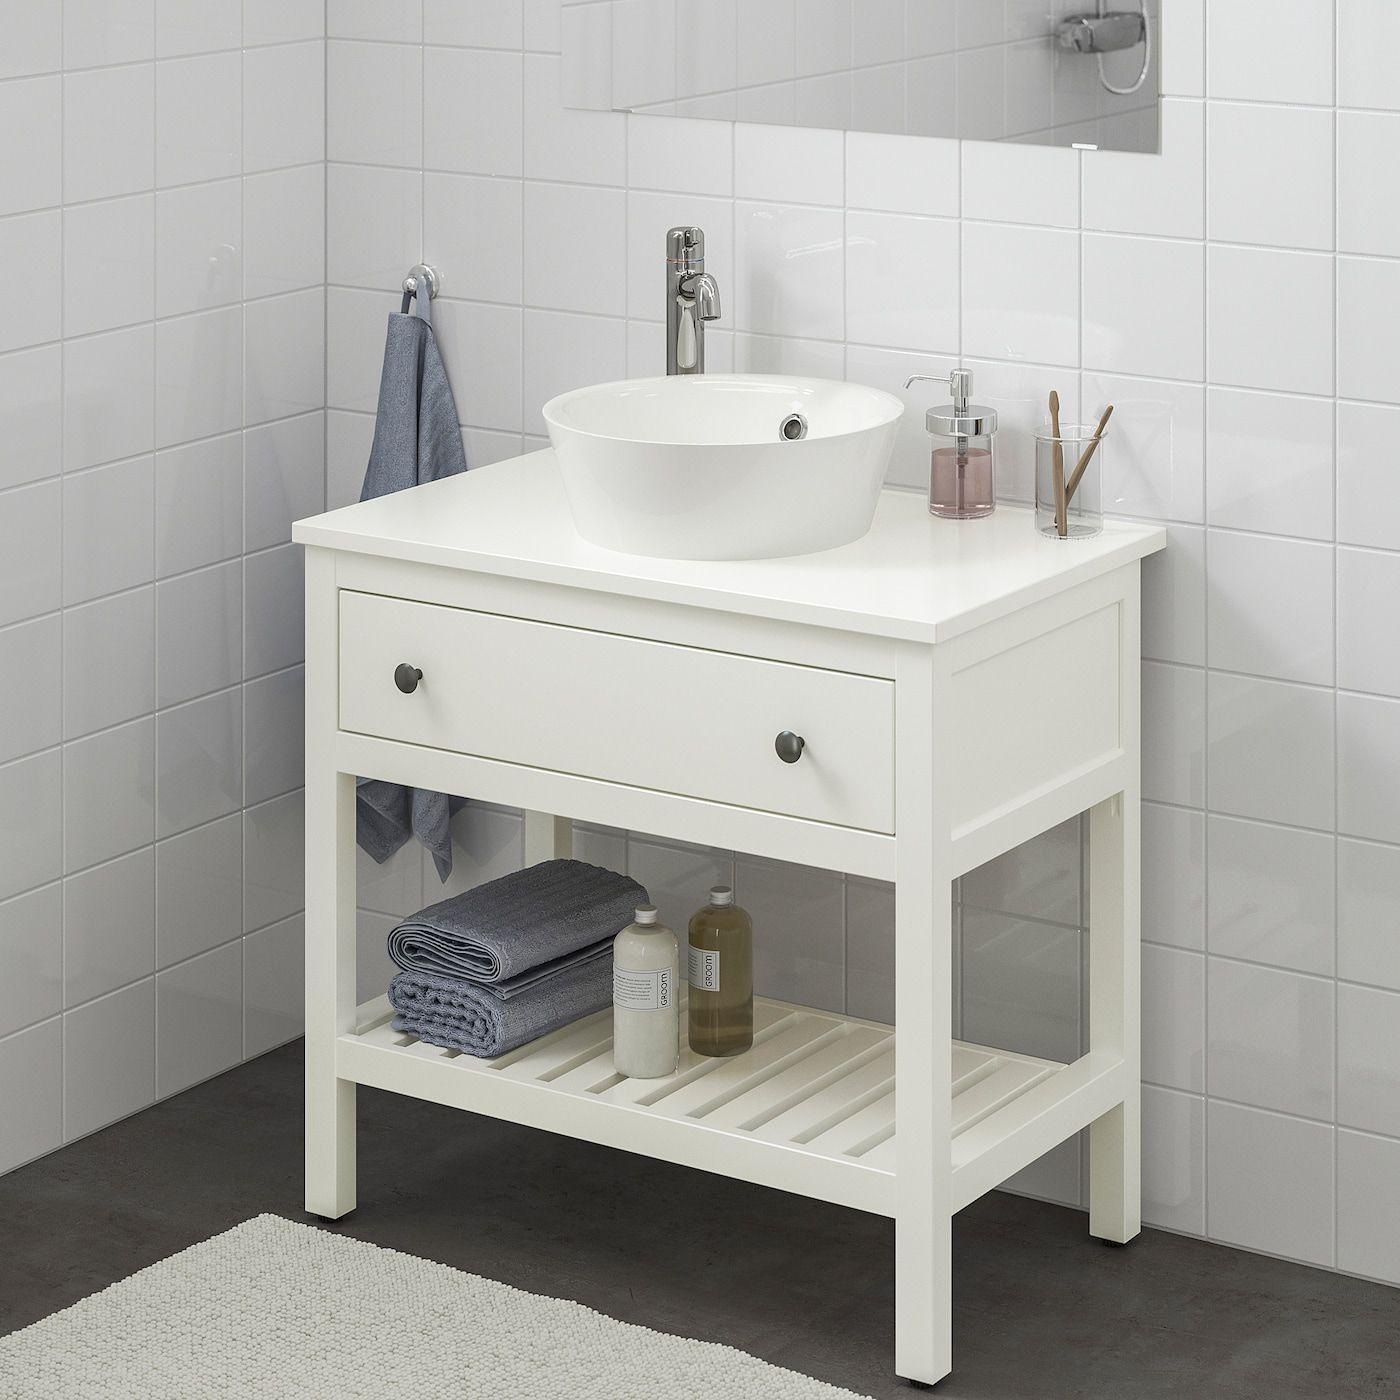 Hemnes Kattevik Open Sink Cabinet With 16 Sink White Voxnan Faucet 32 1 4x18 7 8x35 7 8 In 2020 White Vanity Bathroom Sink Cabinet Ikea Hemnes